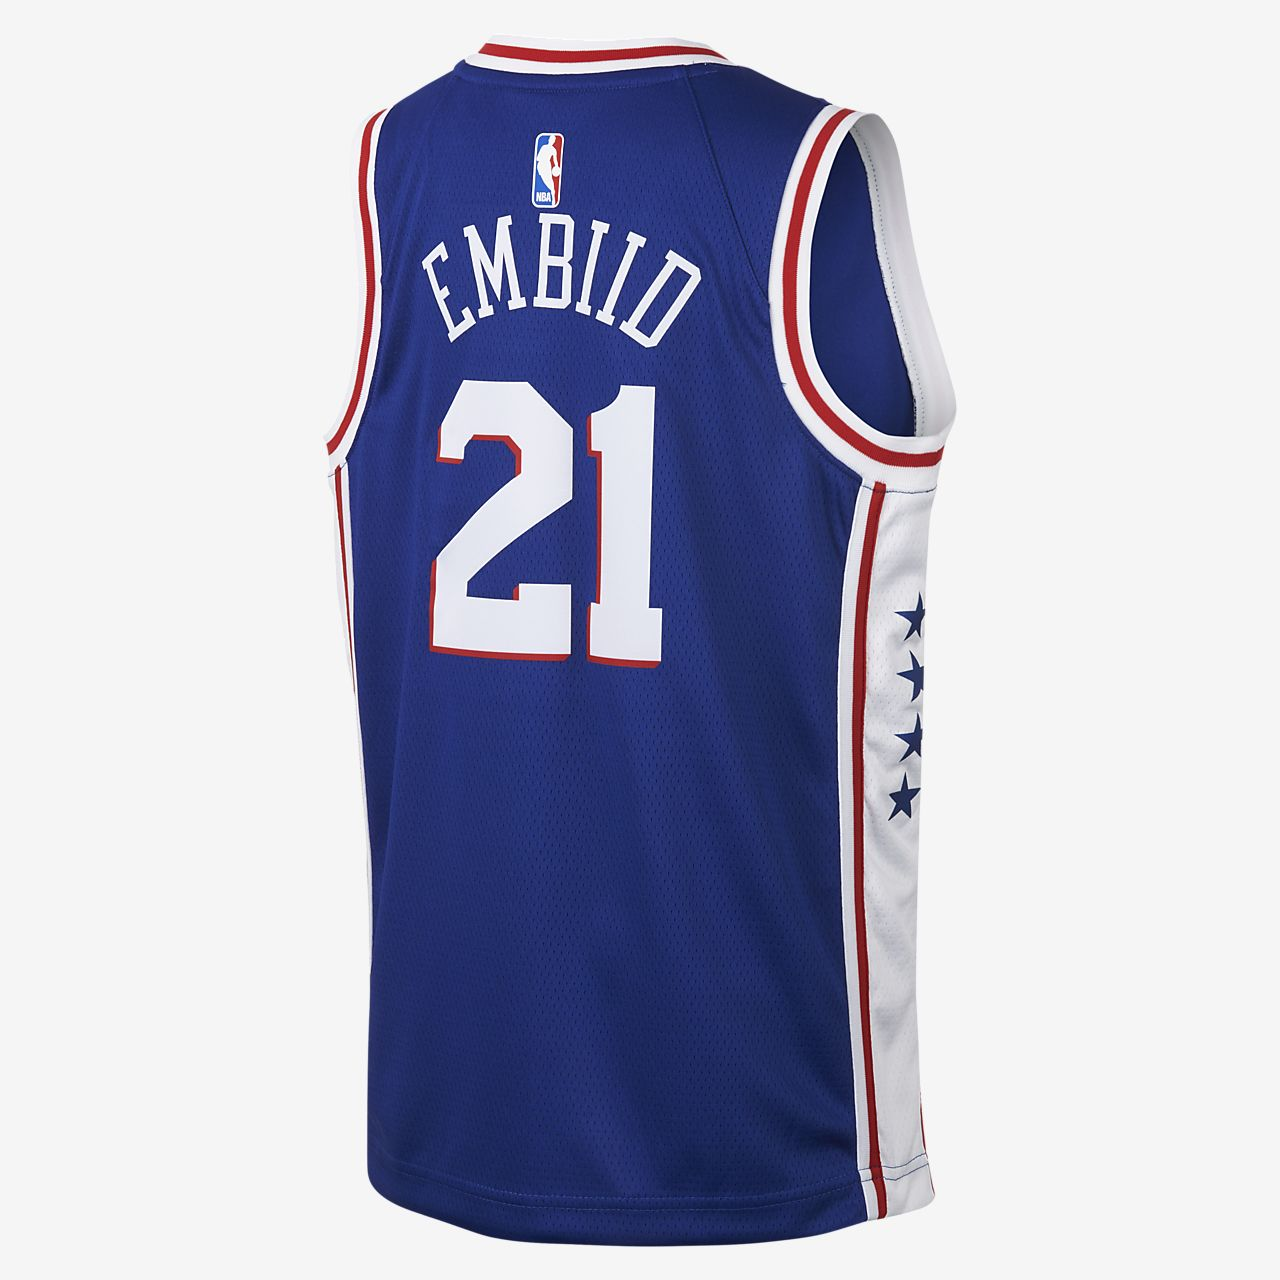 099594721e0c ... Joel Embiid Philadelphia 76ers Nike Icon Edition Swingman Big Kids  NBA  Jersey